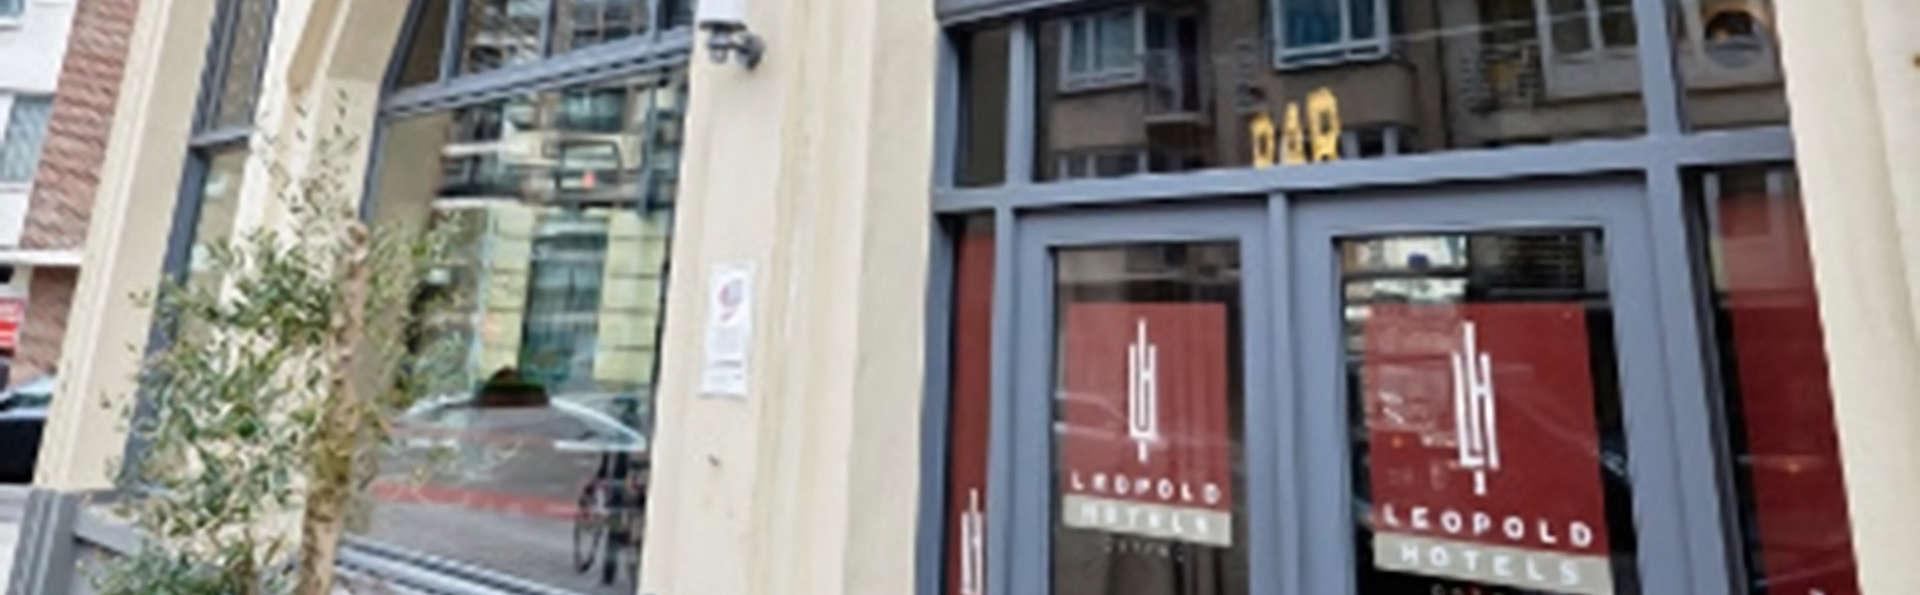 Leopold Hotel Ostend - edit_facade.jpg